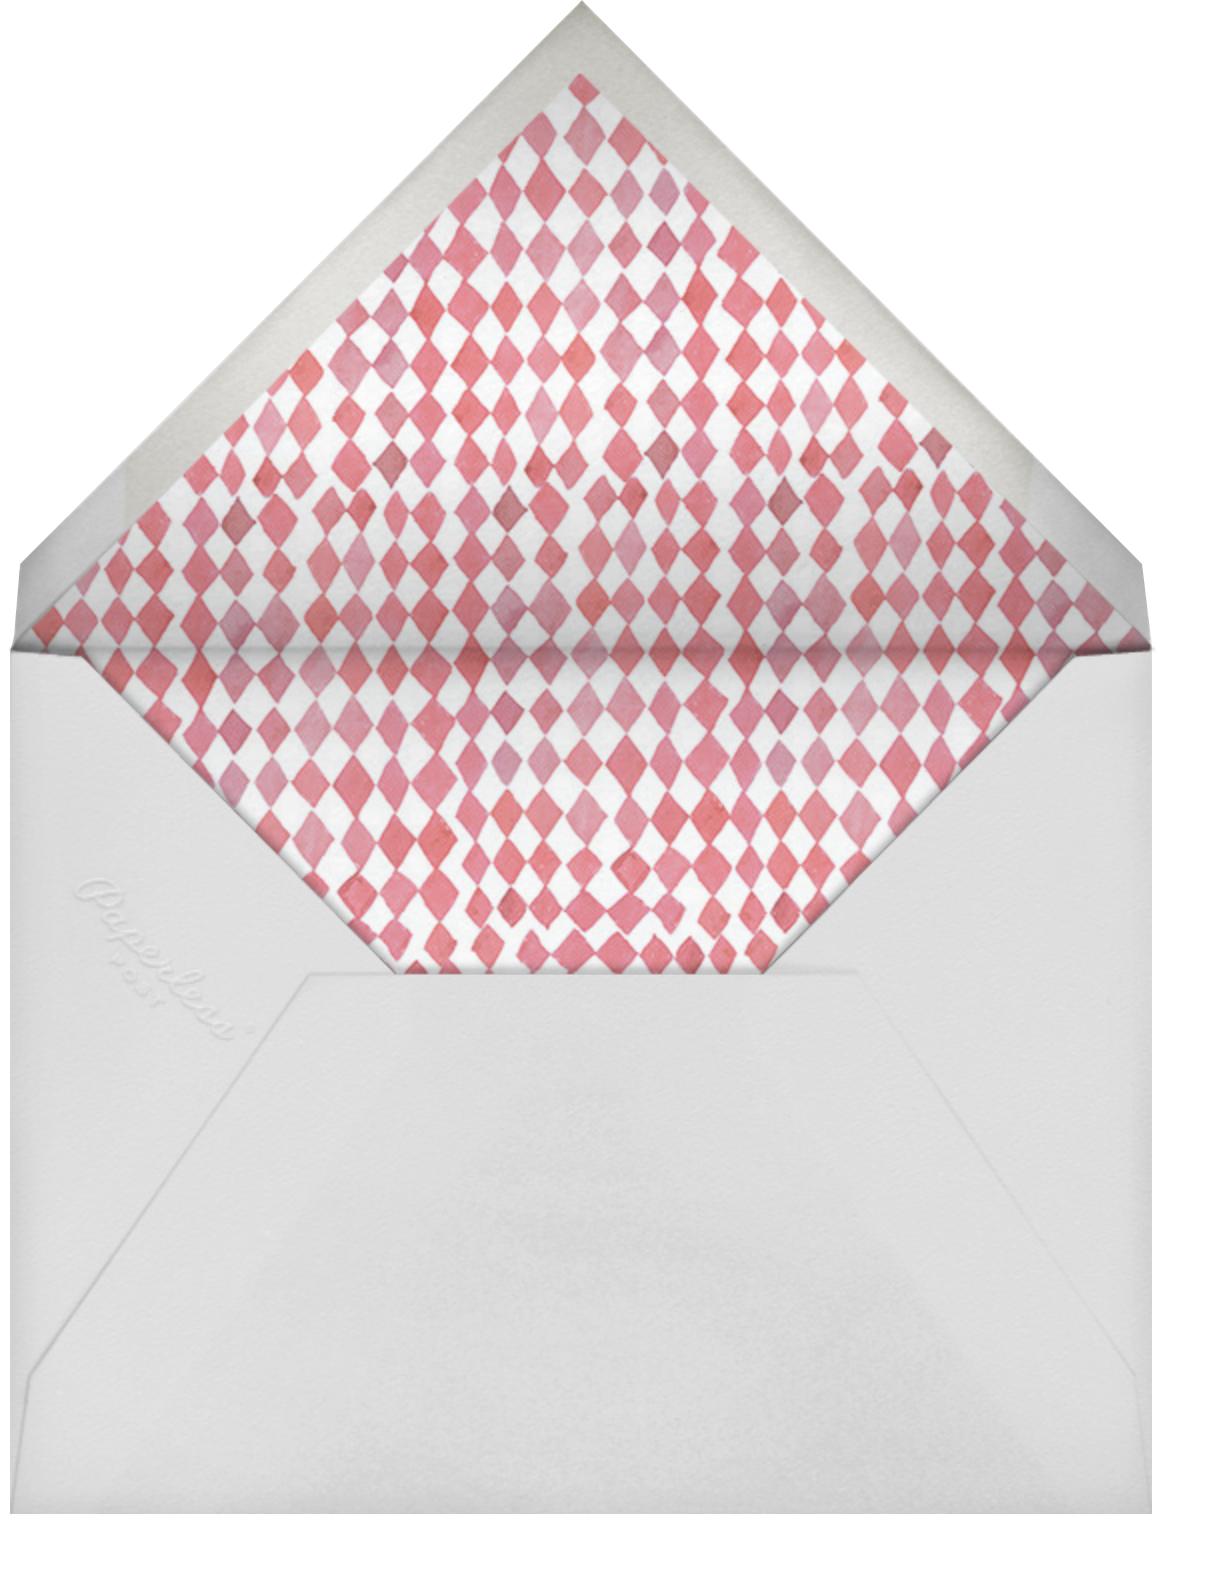 Budding Bunnies - Happy Menocal - Woodland baby shower invitations - envelope back